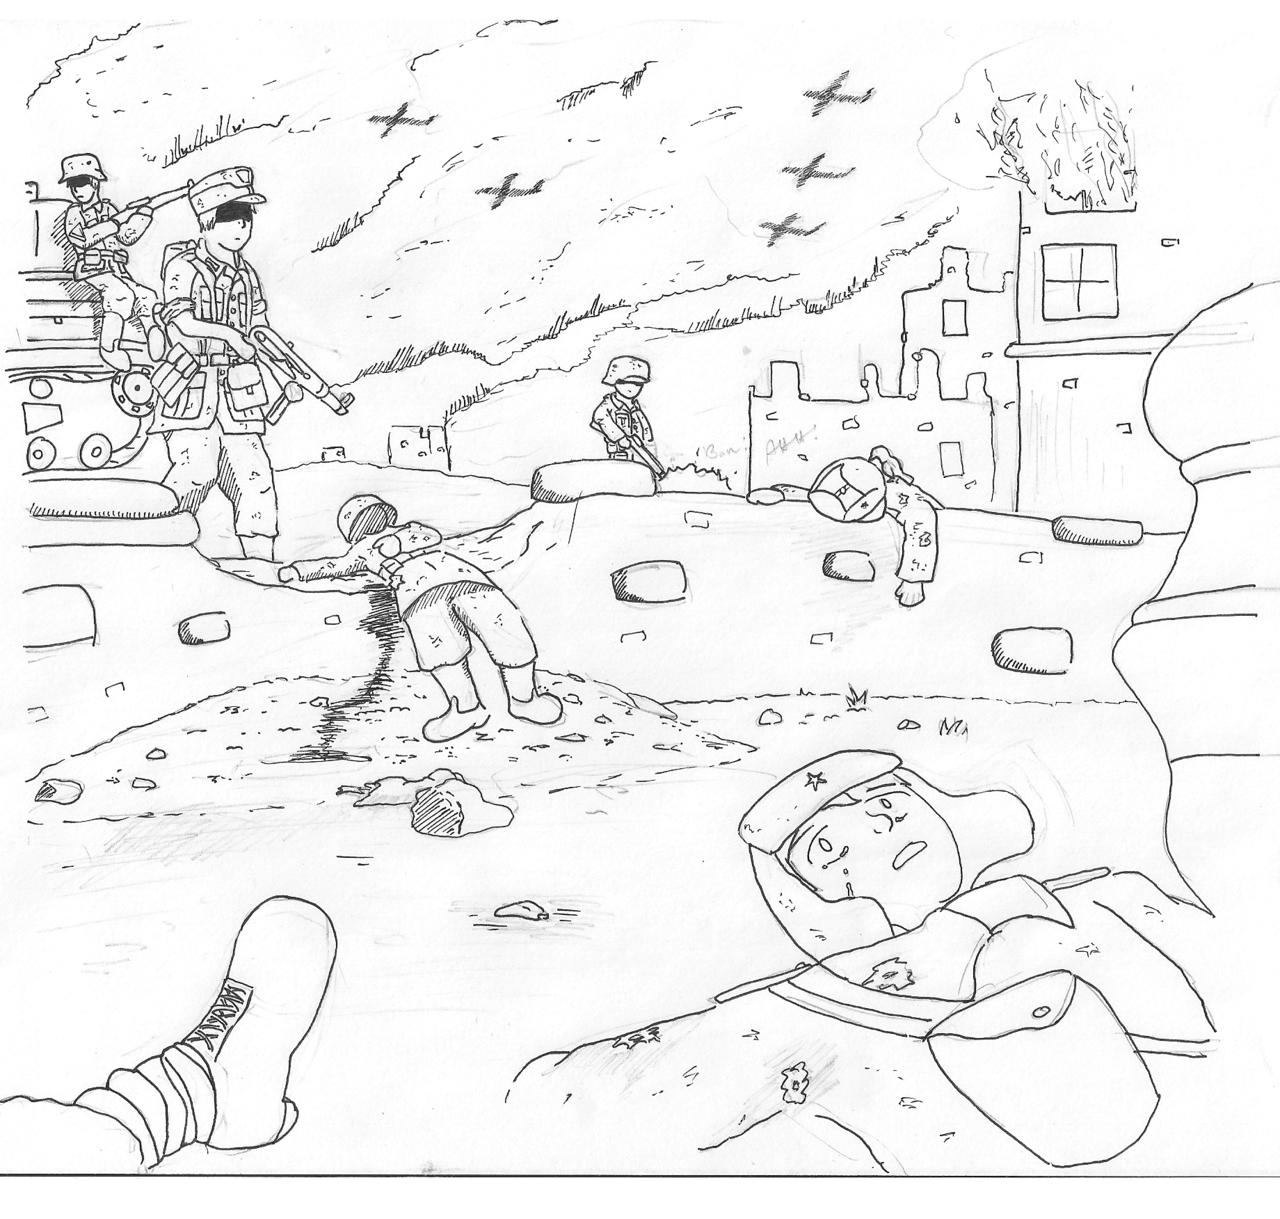 1280x1219 Ww2 Drawings By Desynchronizer